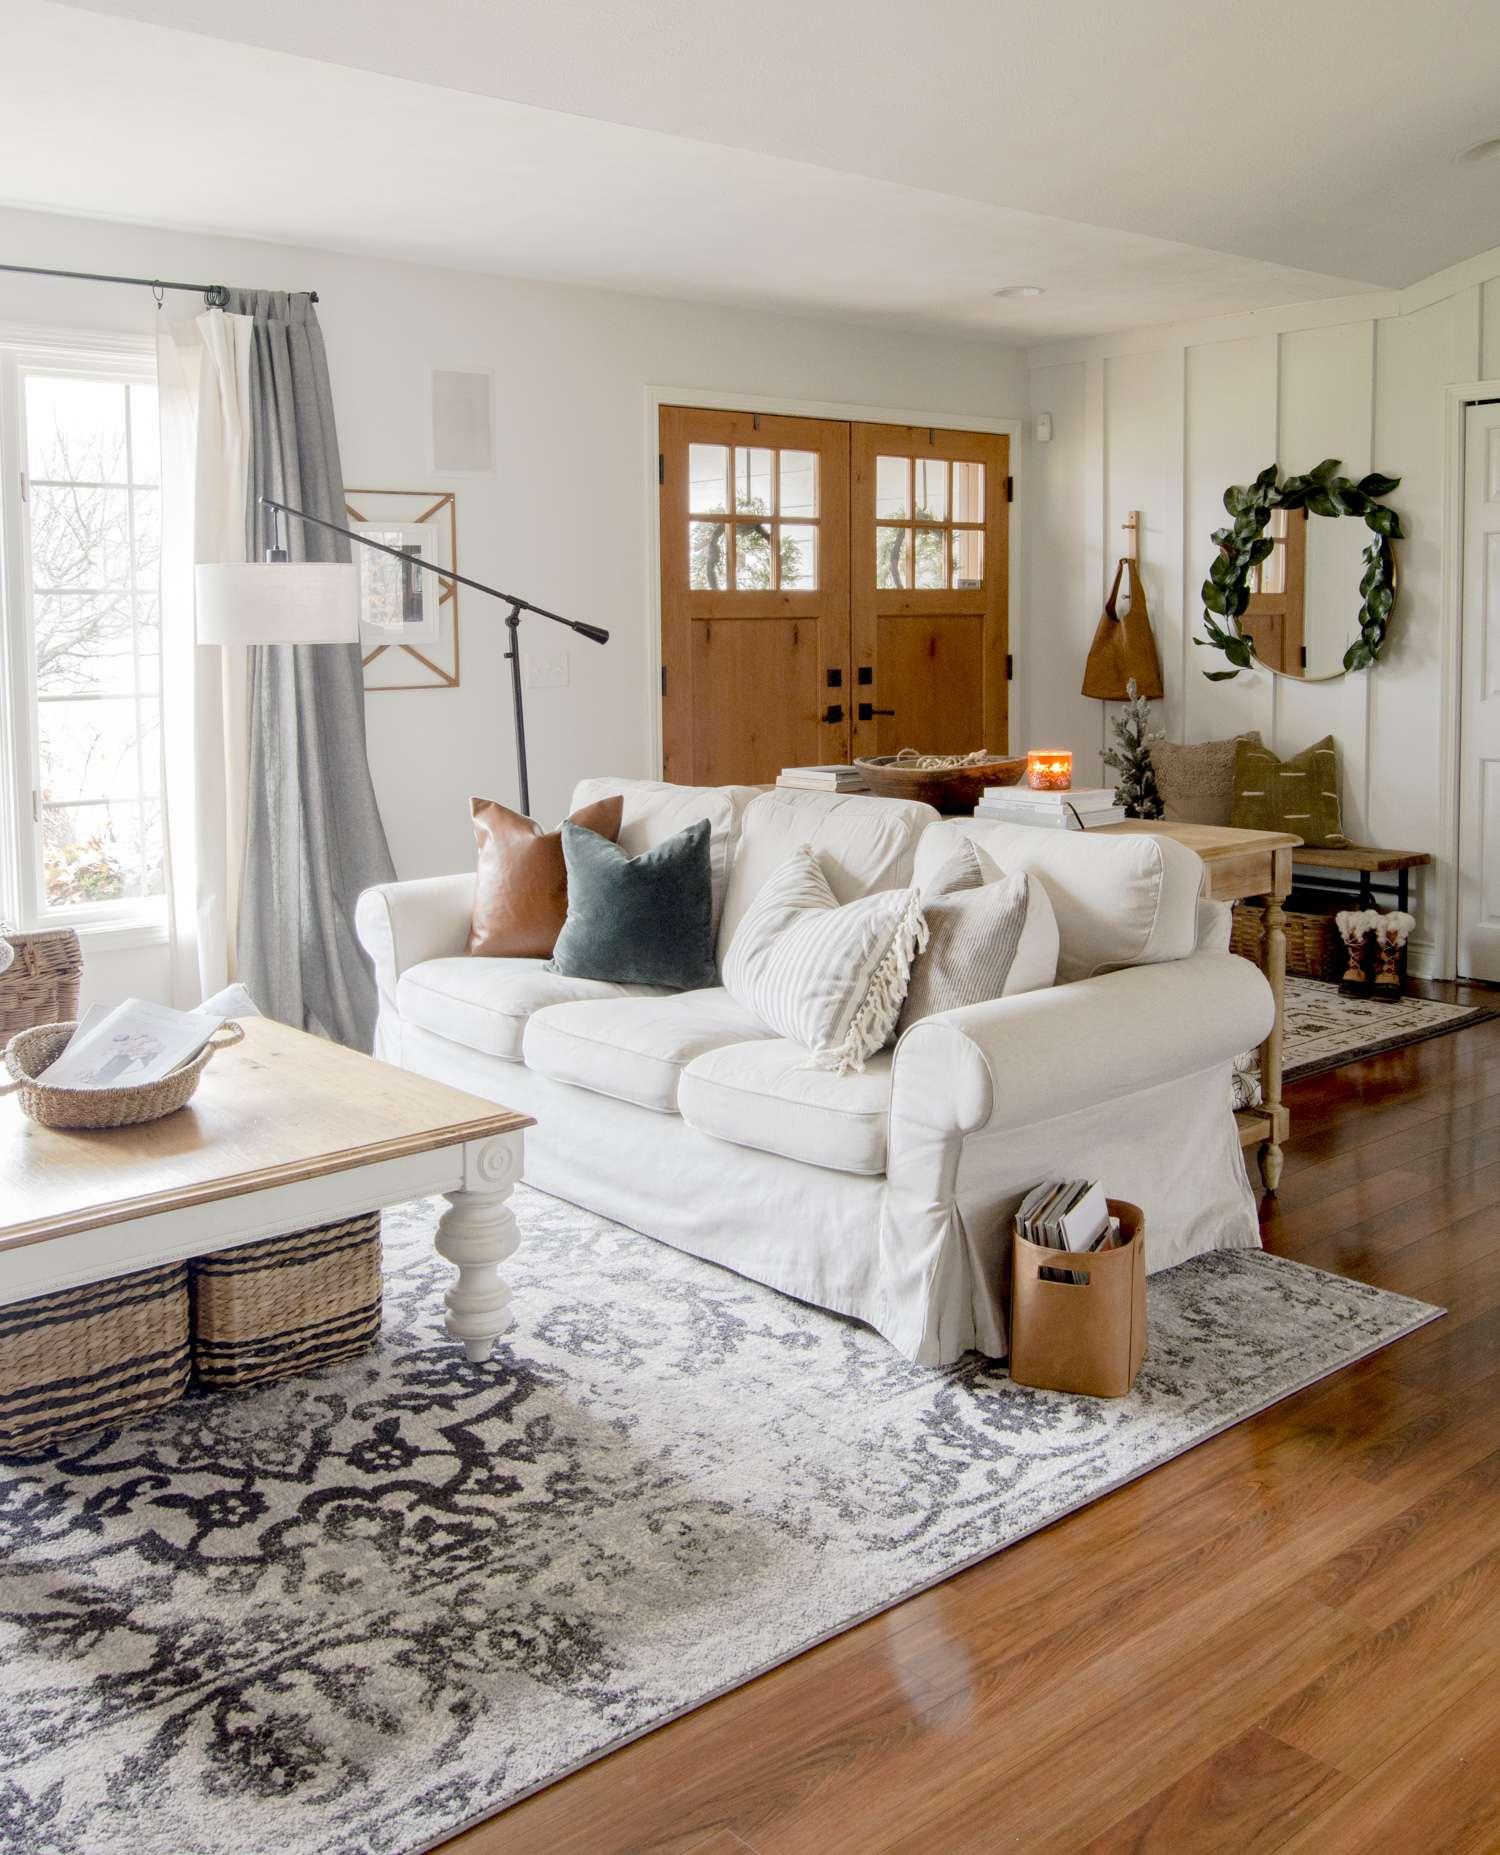 Cozy home furniture pieces.